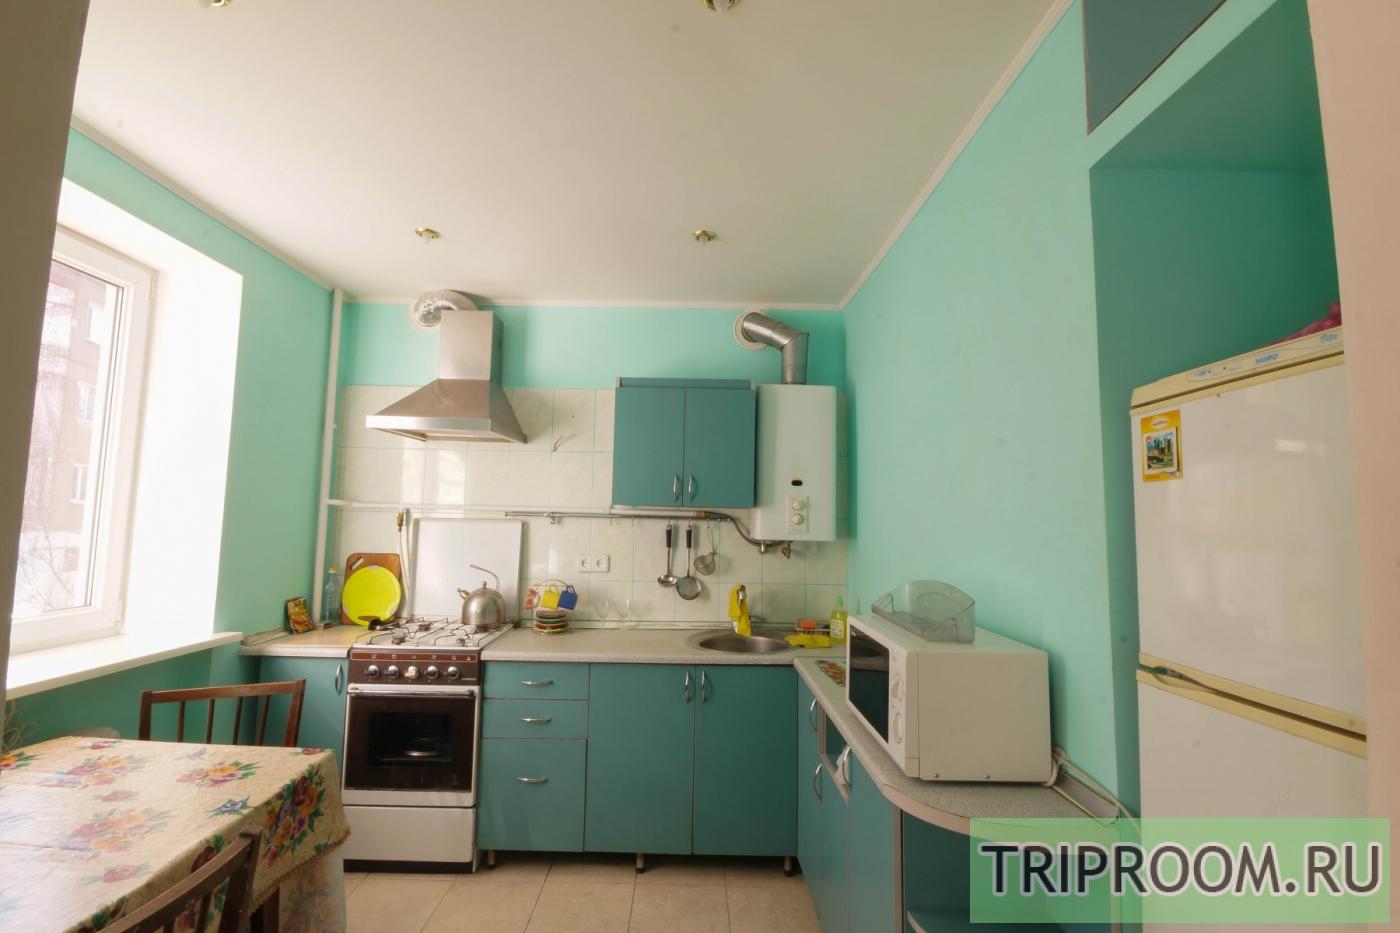 3-комнатная квартира посуточно (вариант № 19470), ул. Спера улица, фото № 6